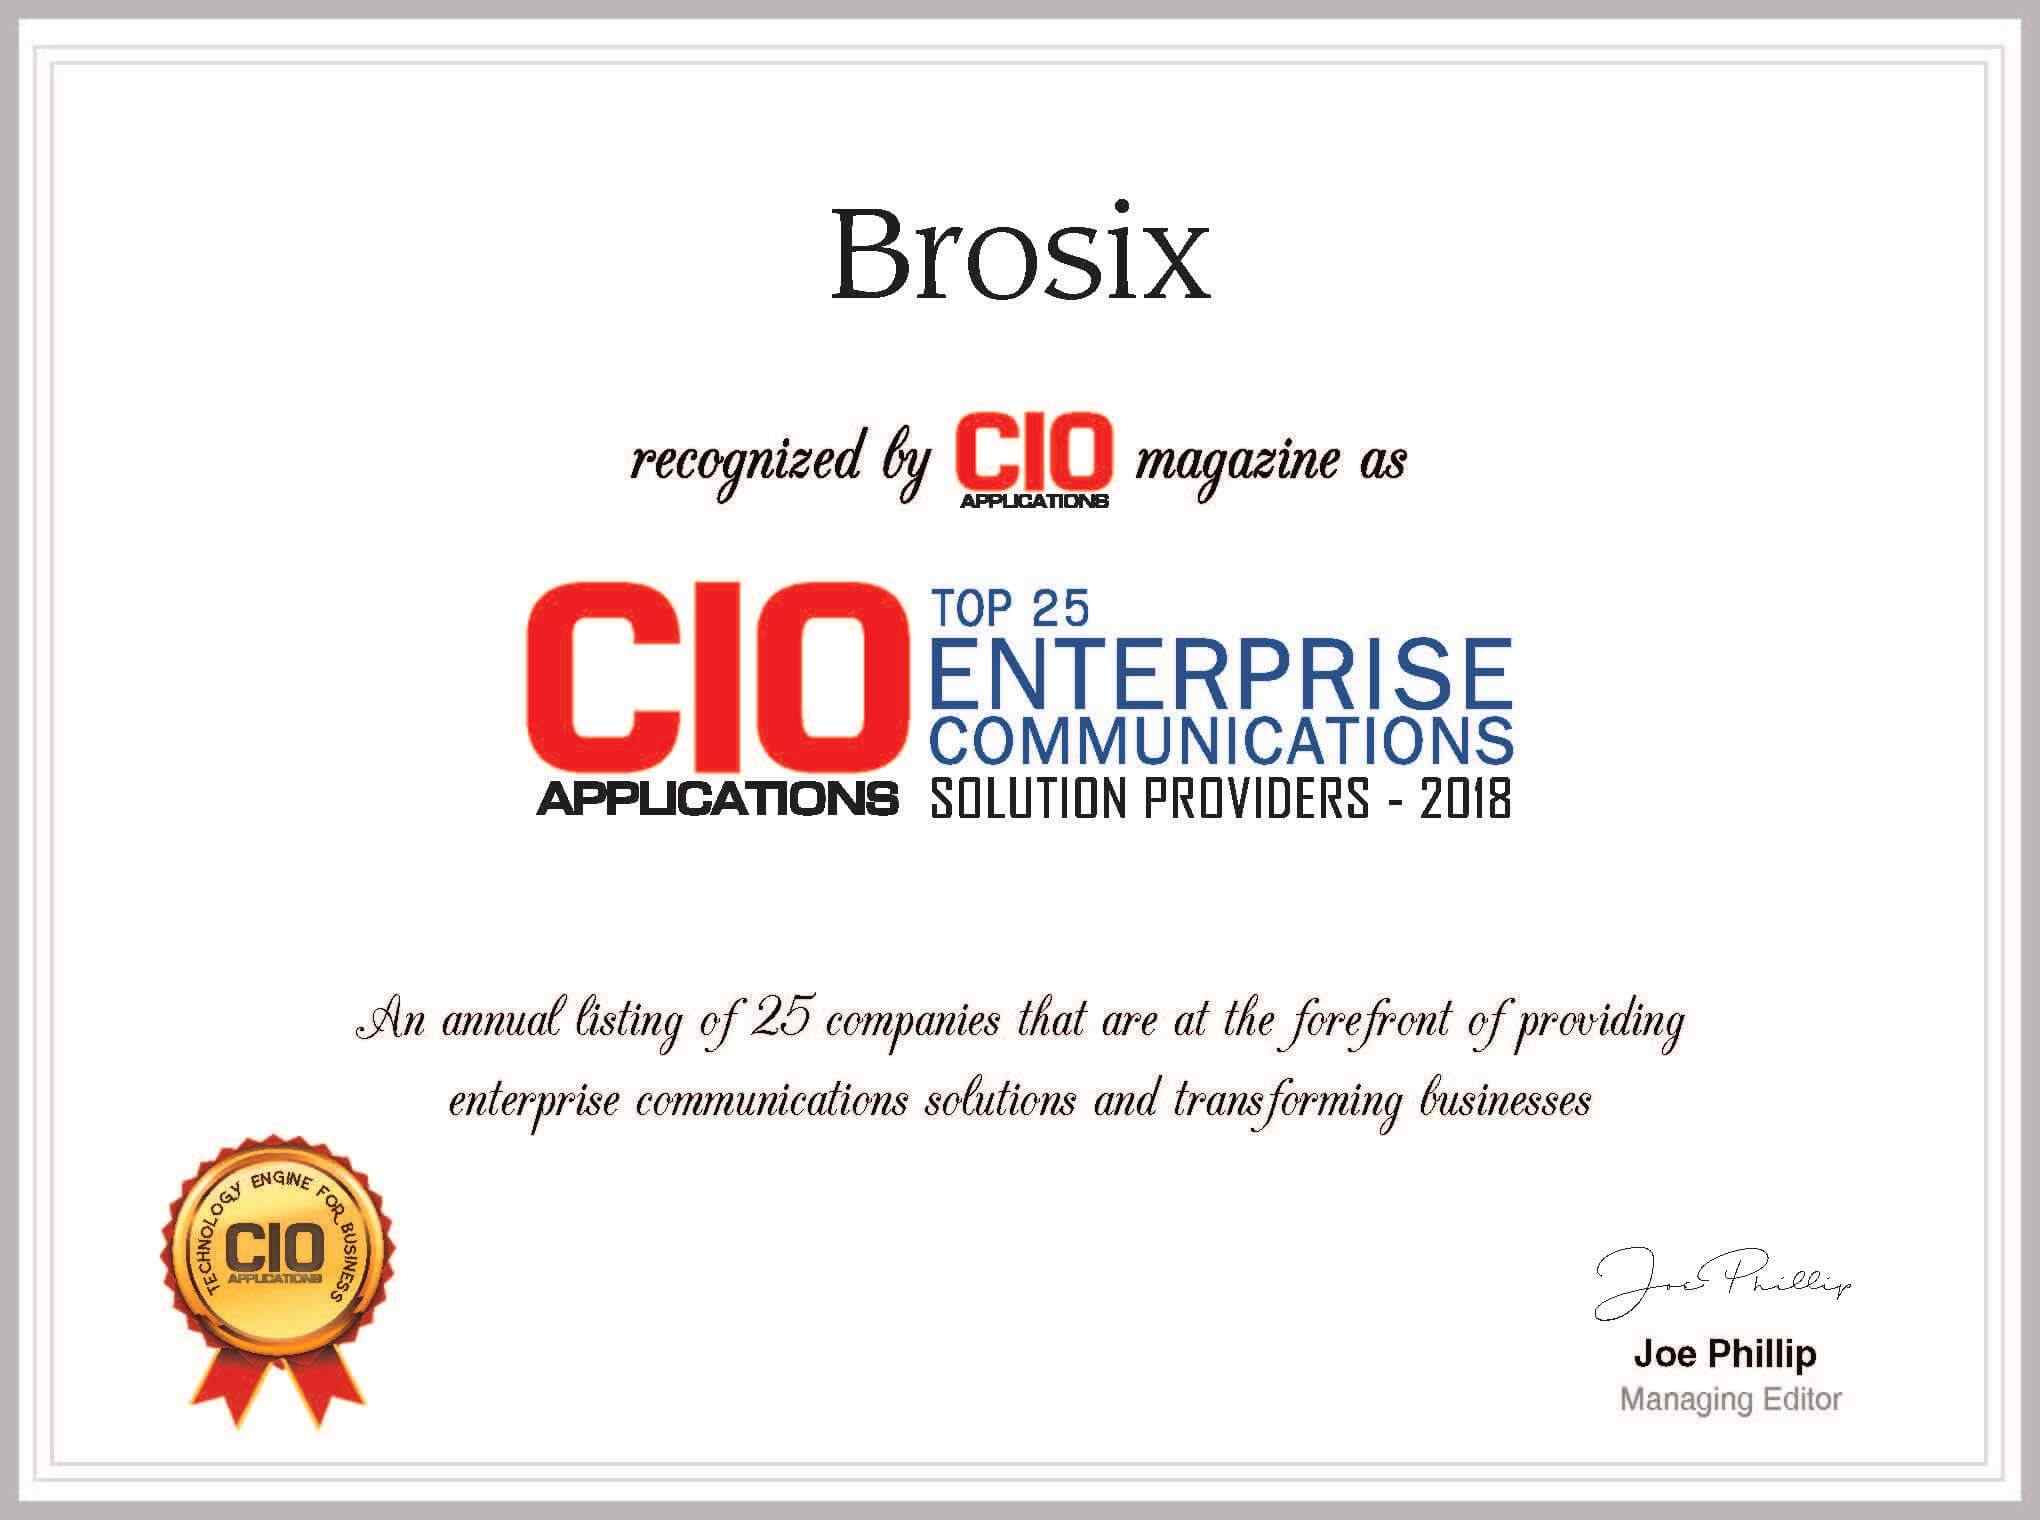 Brosix among one of 25 enterprise communication solutions